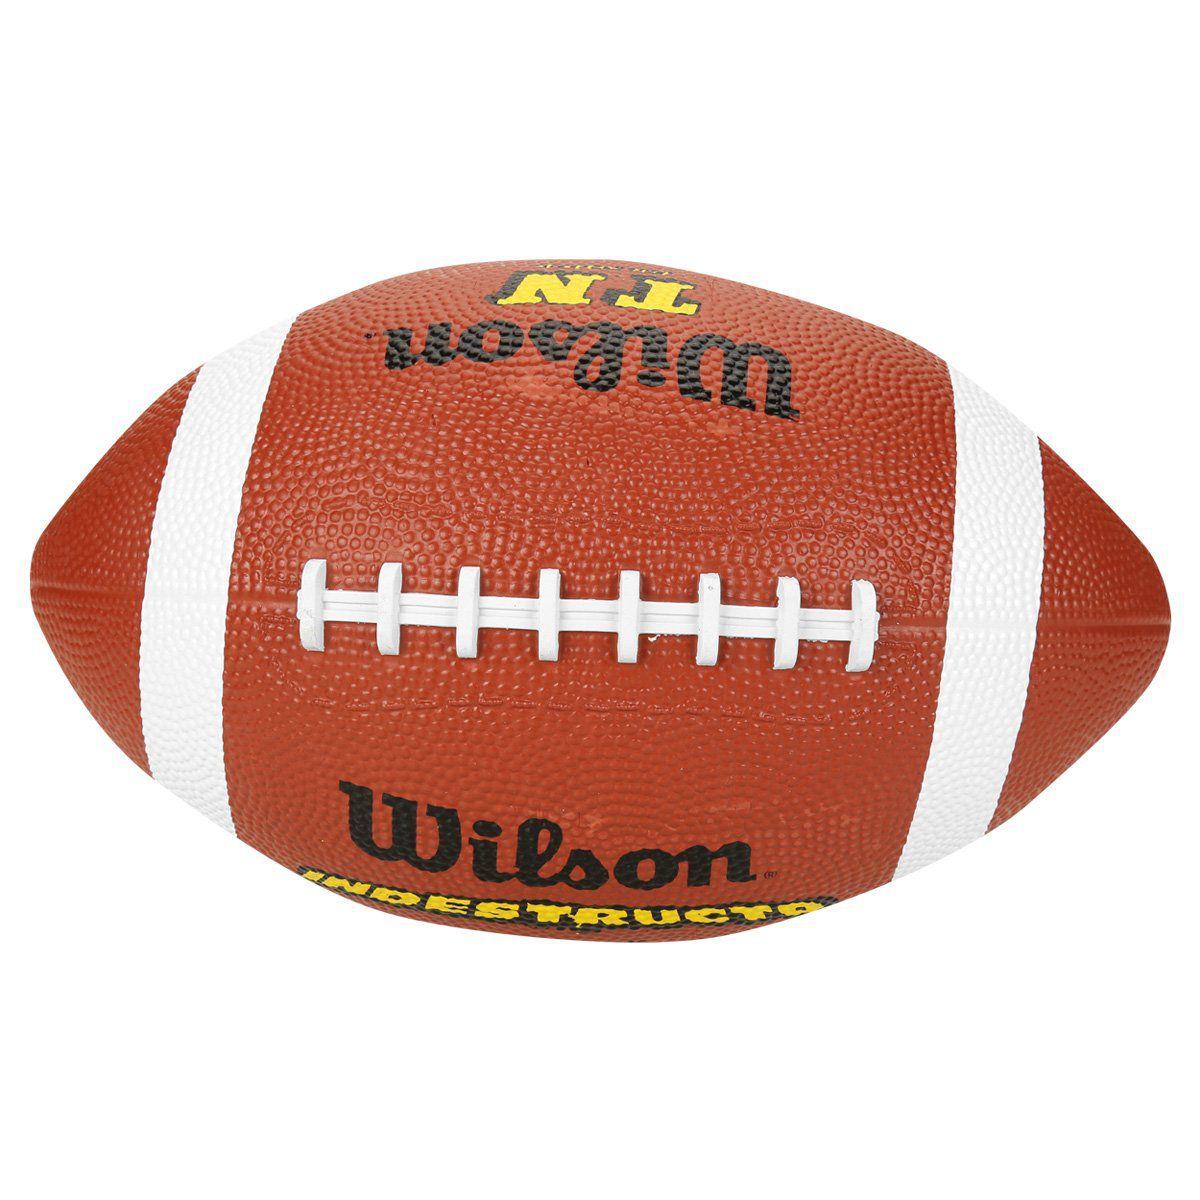 Bola de Futebol Americano Wilson Official Indestructo  - REAL ESPORTE